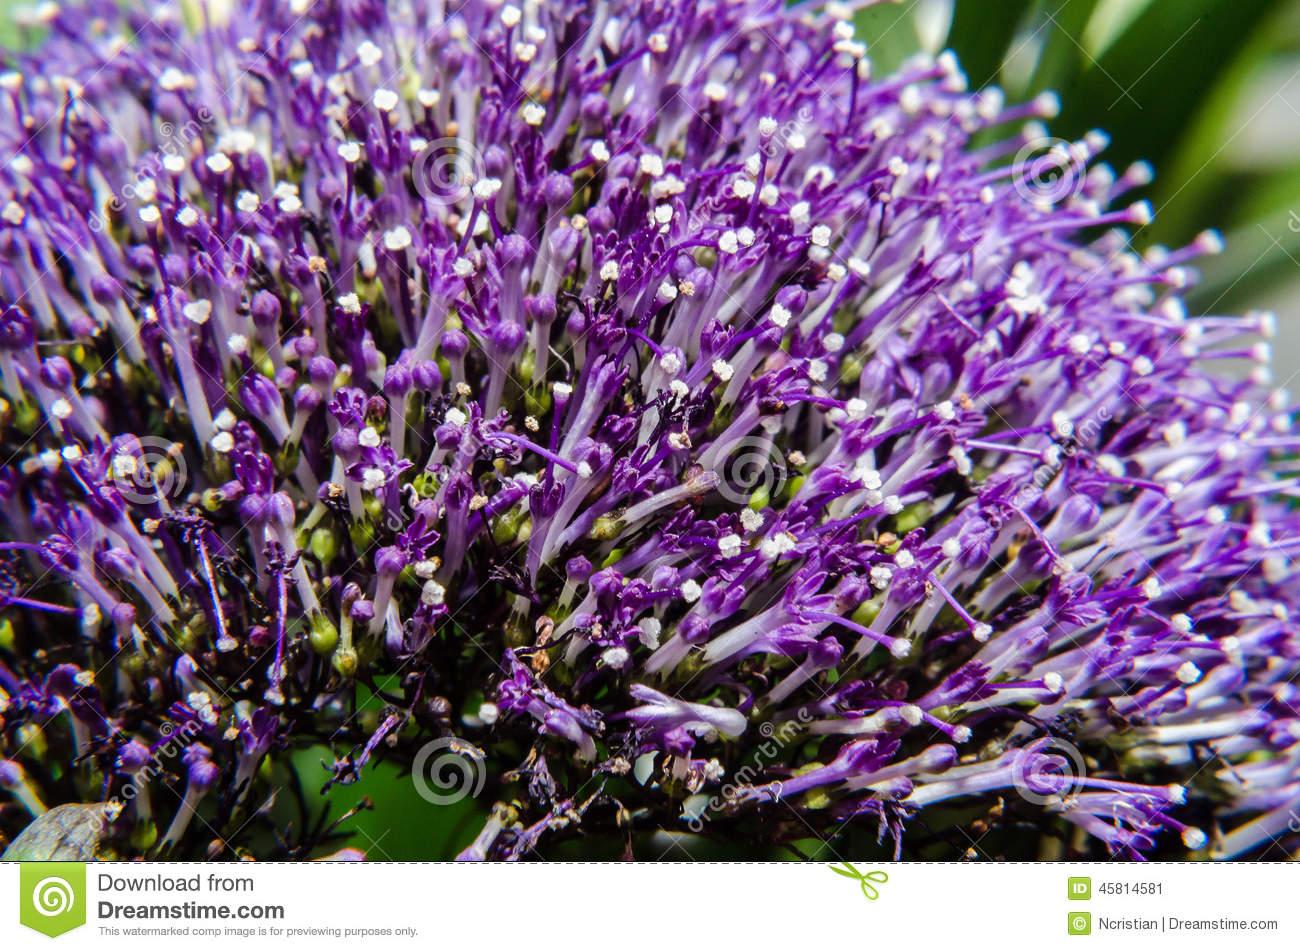 Detail Of Violet Caryopteris Flower, Clandonensis Heavenly Blue.